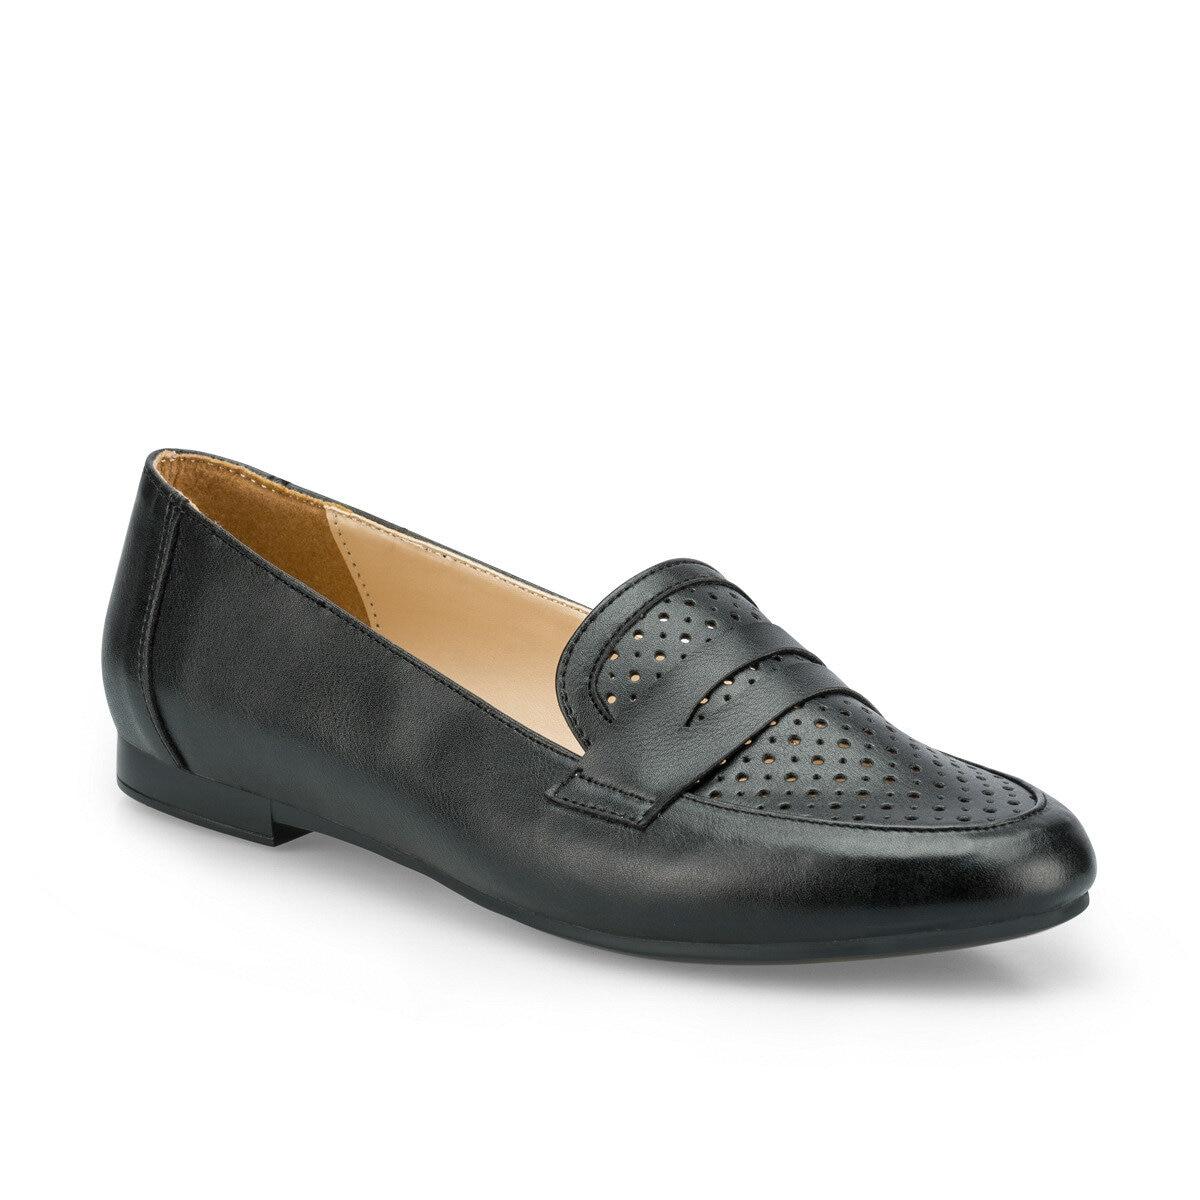 FLO 315091.Z Black Women Loafer Shoes Polaris